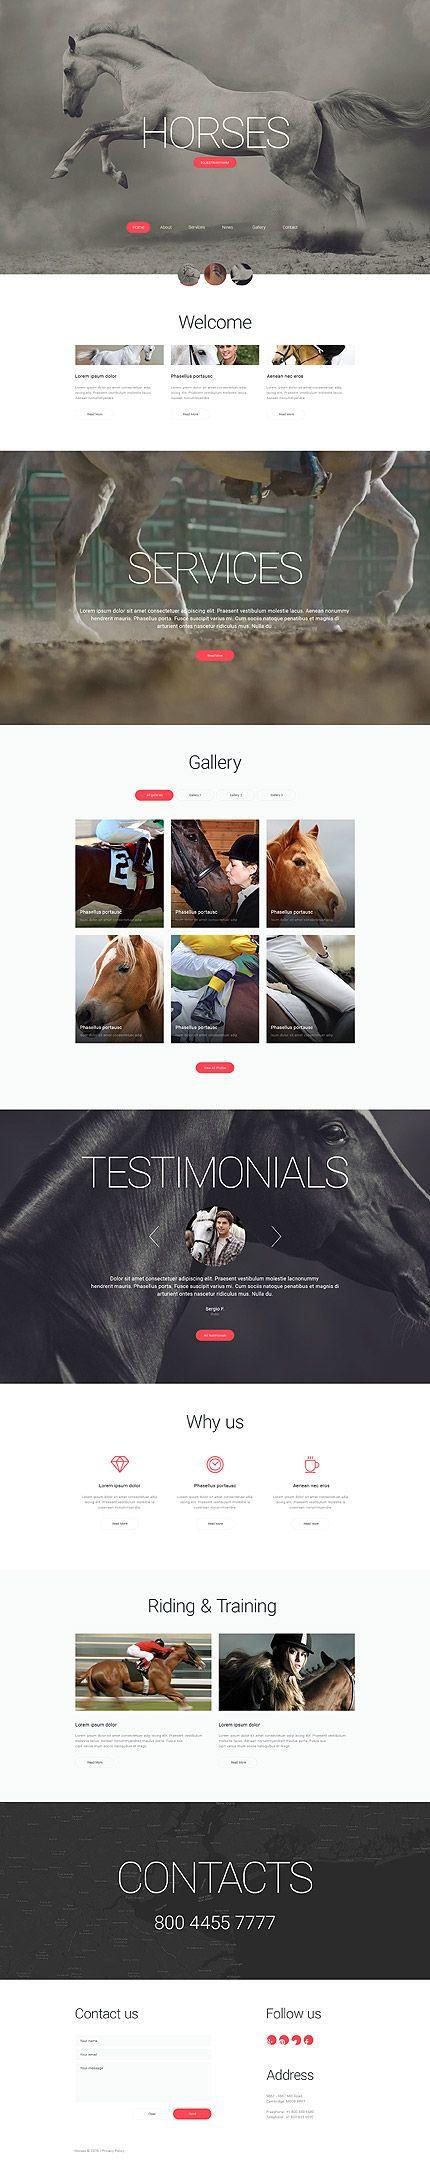 Equestrian Farm #website #template. #themes #business #responsive #websitethemes